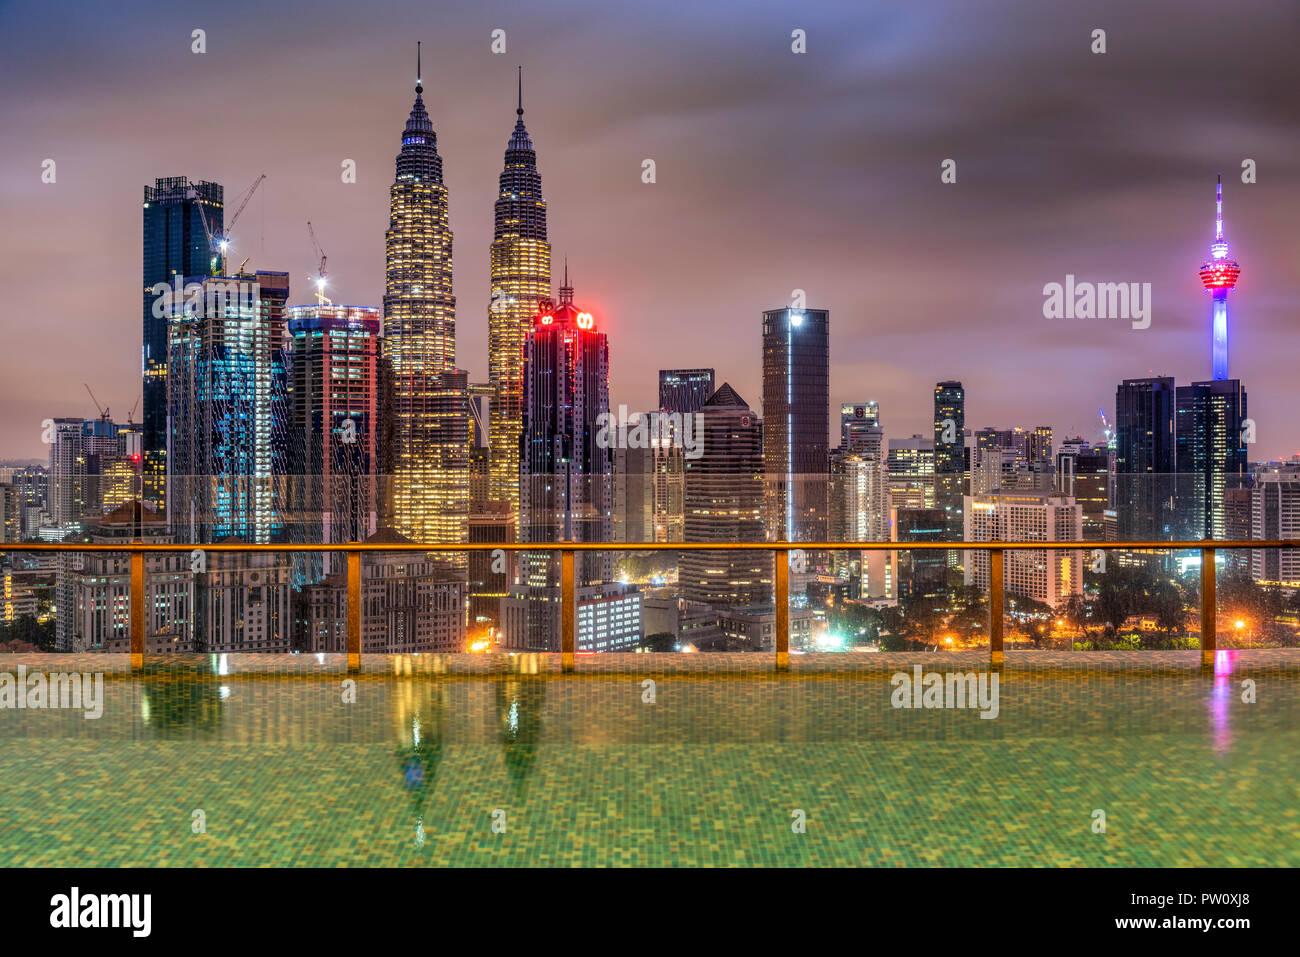 City skyline with infinity pool, Kuala Lumpur, Malaysia - Stock Image